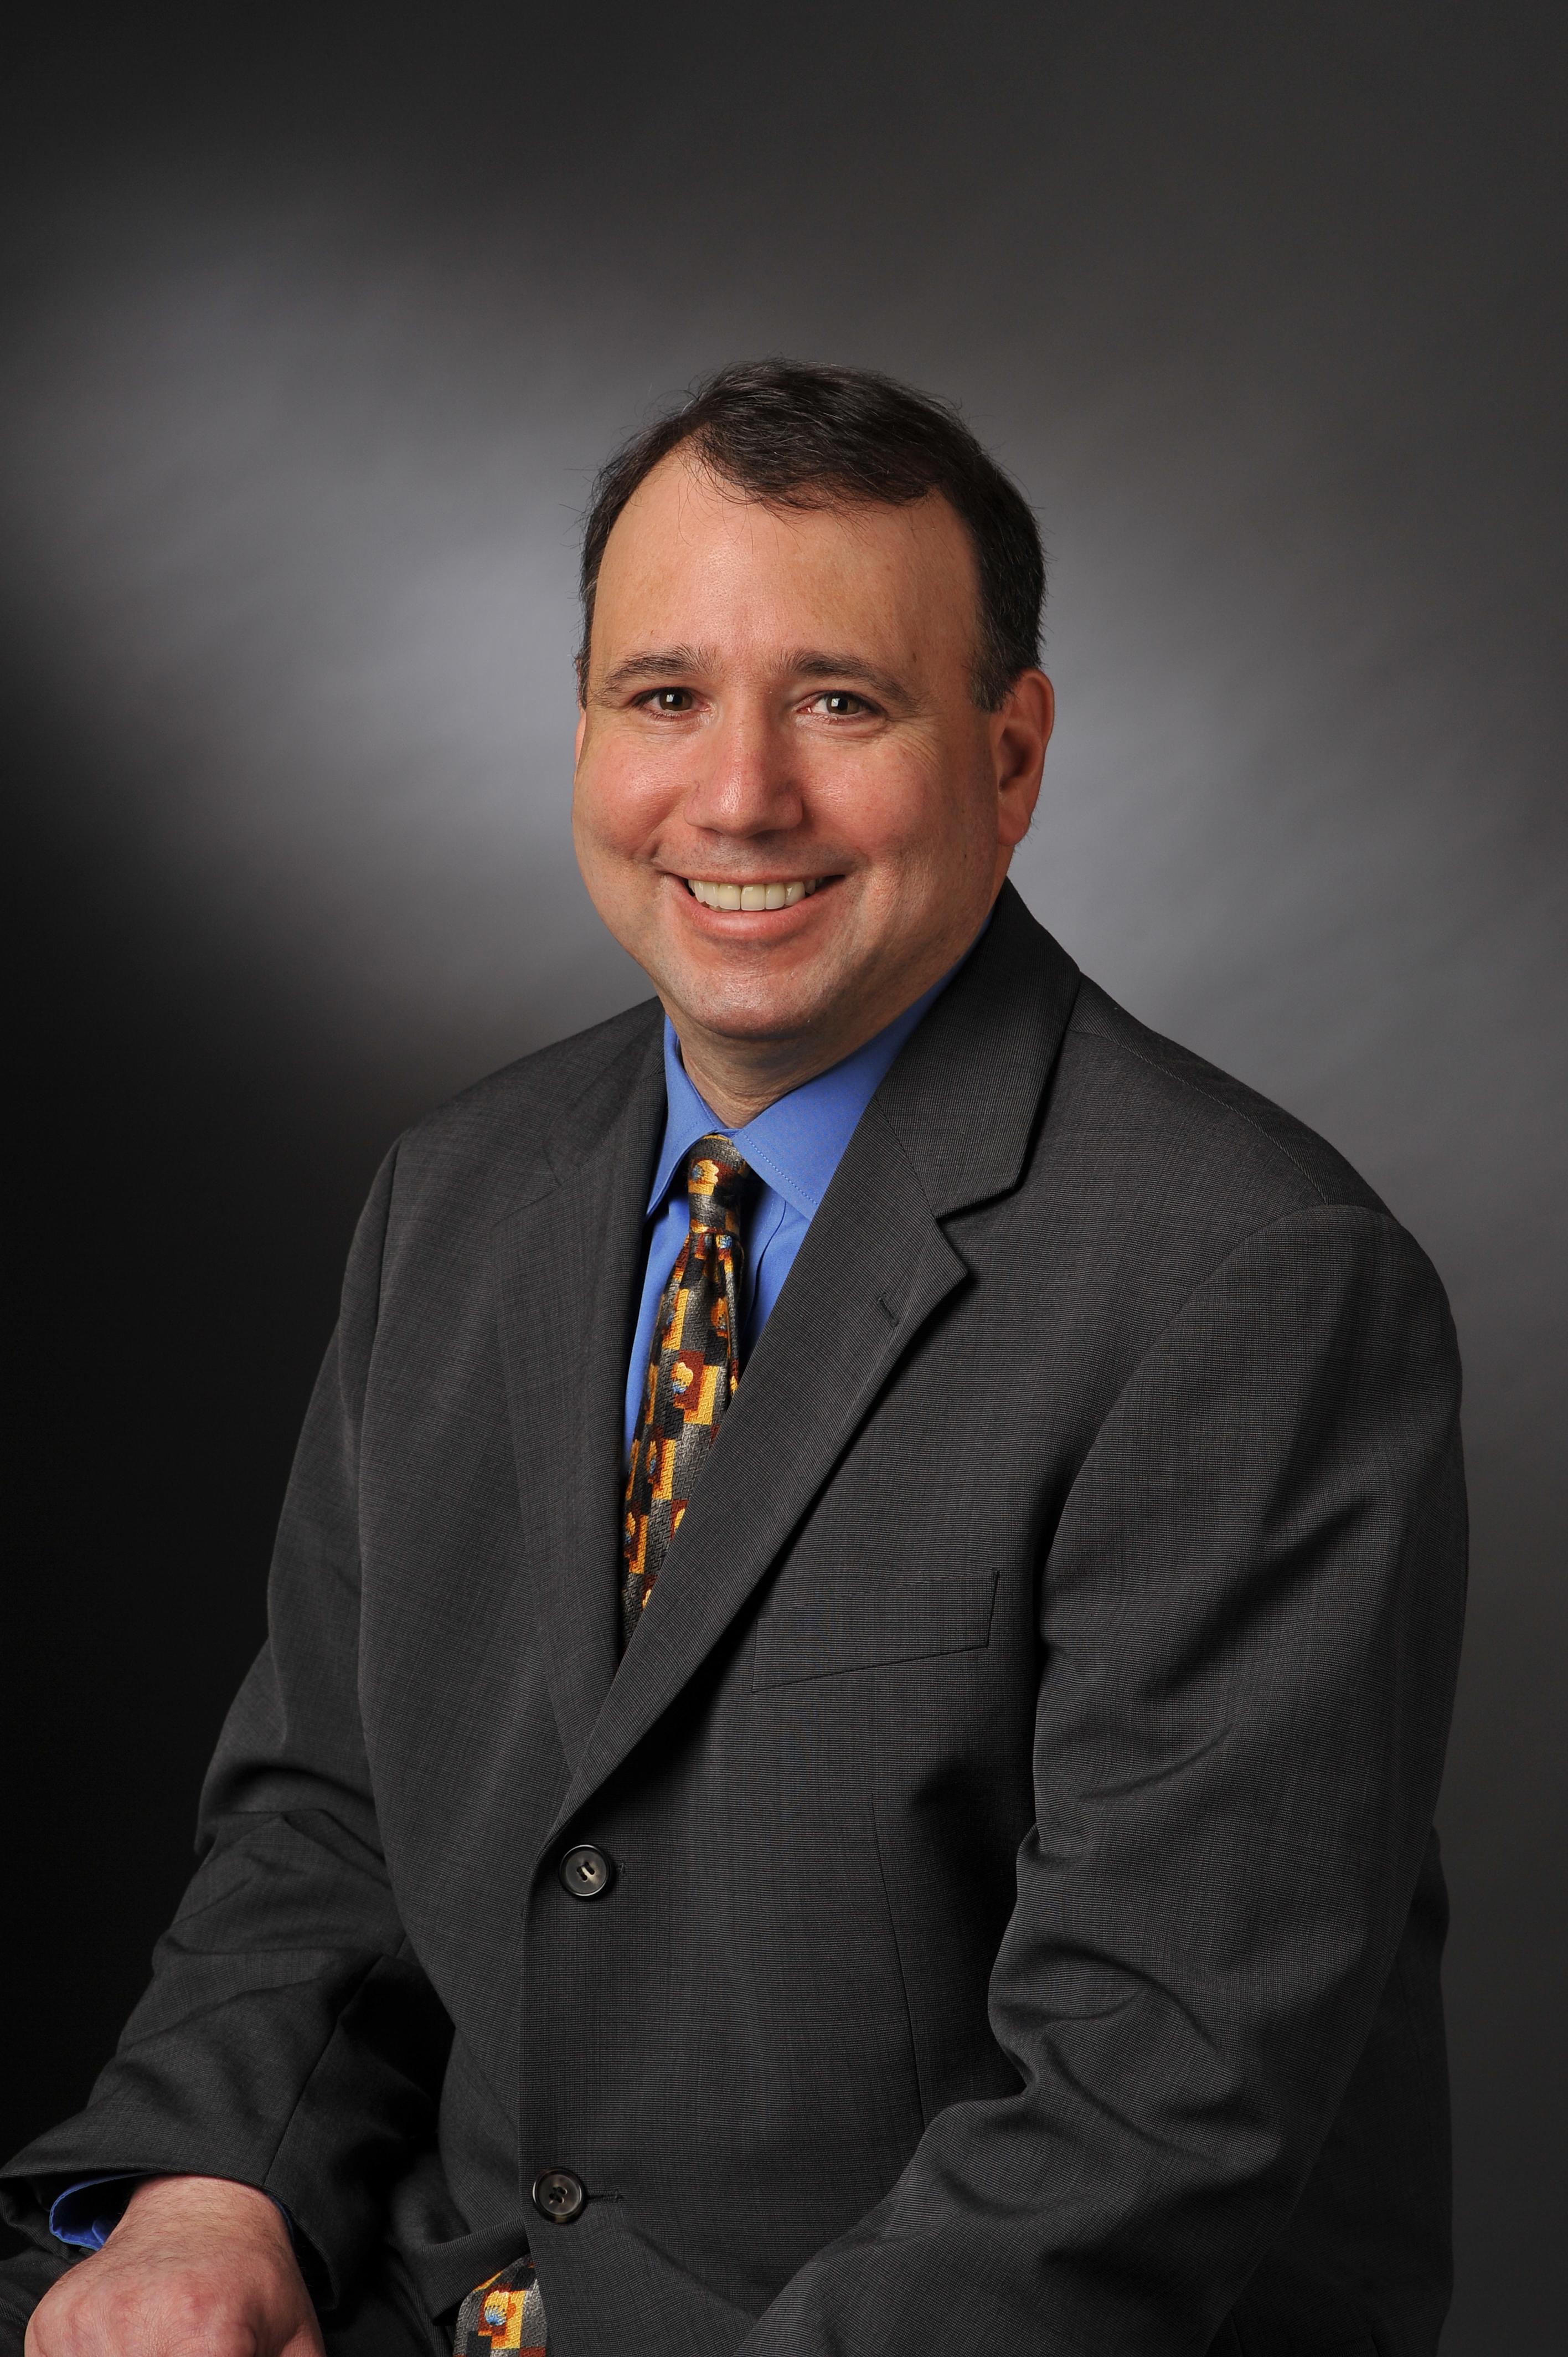 Marc Lipton, MD